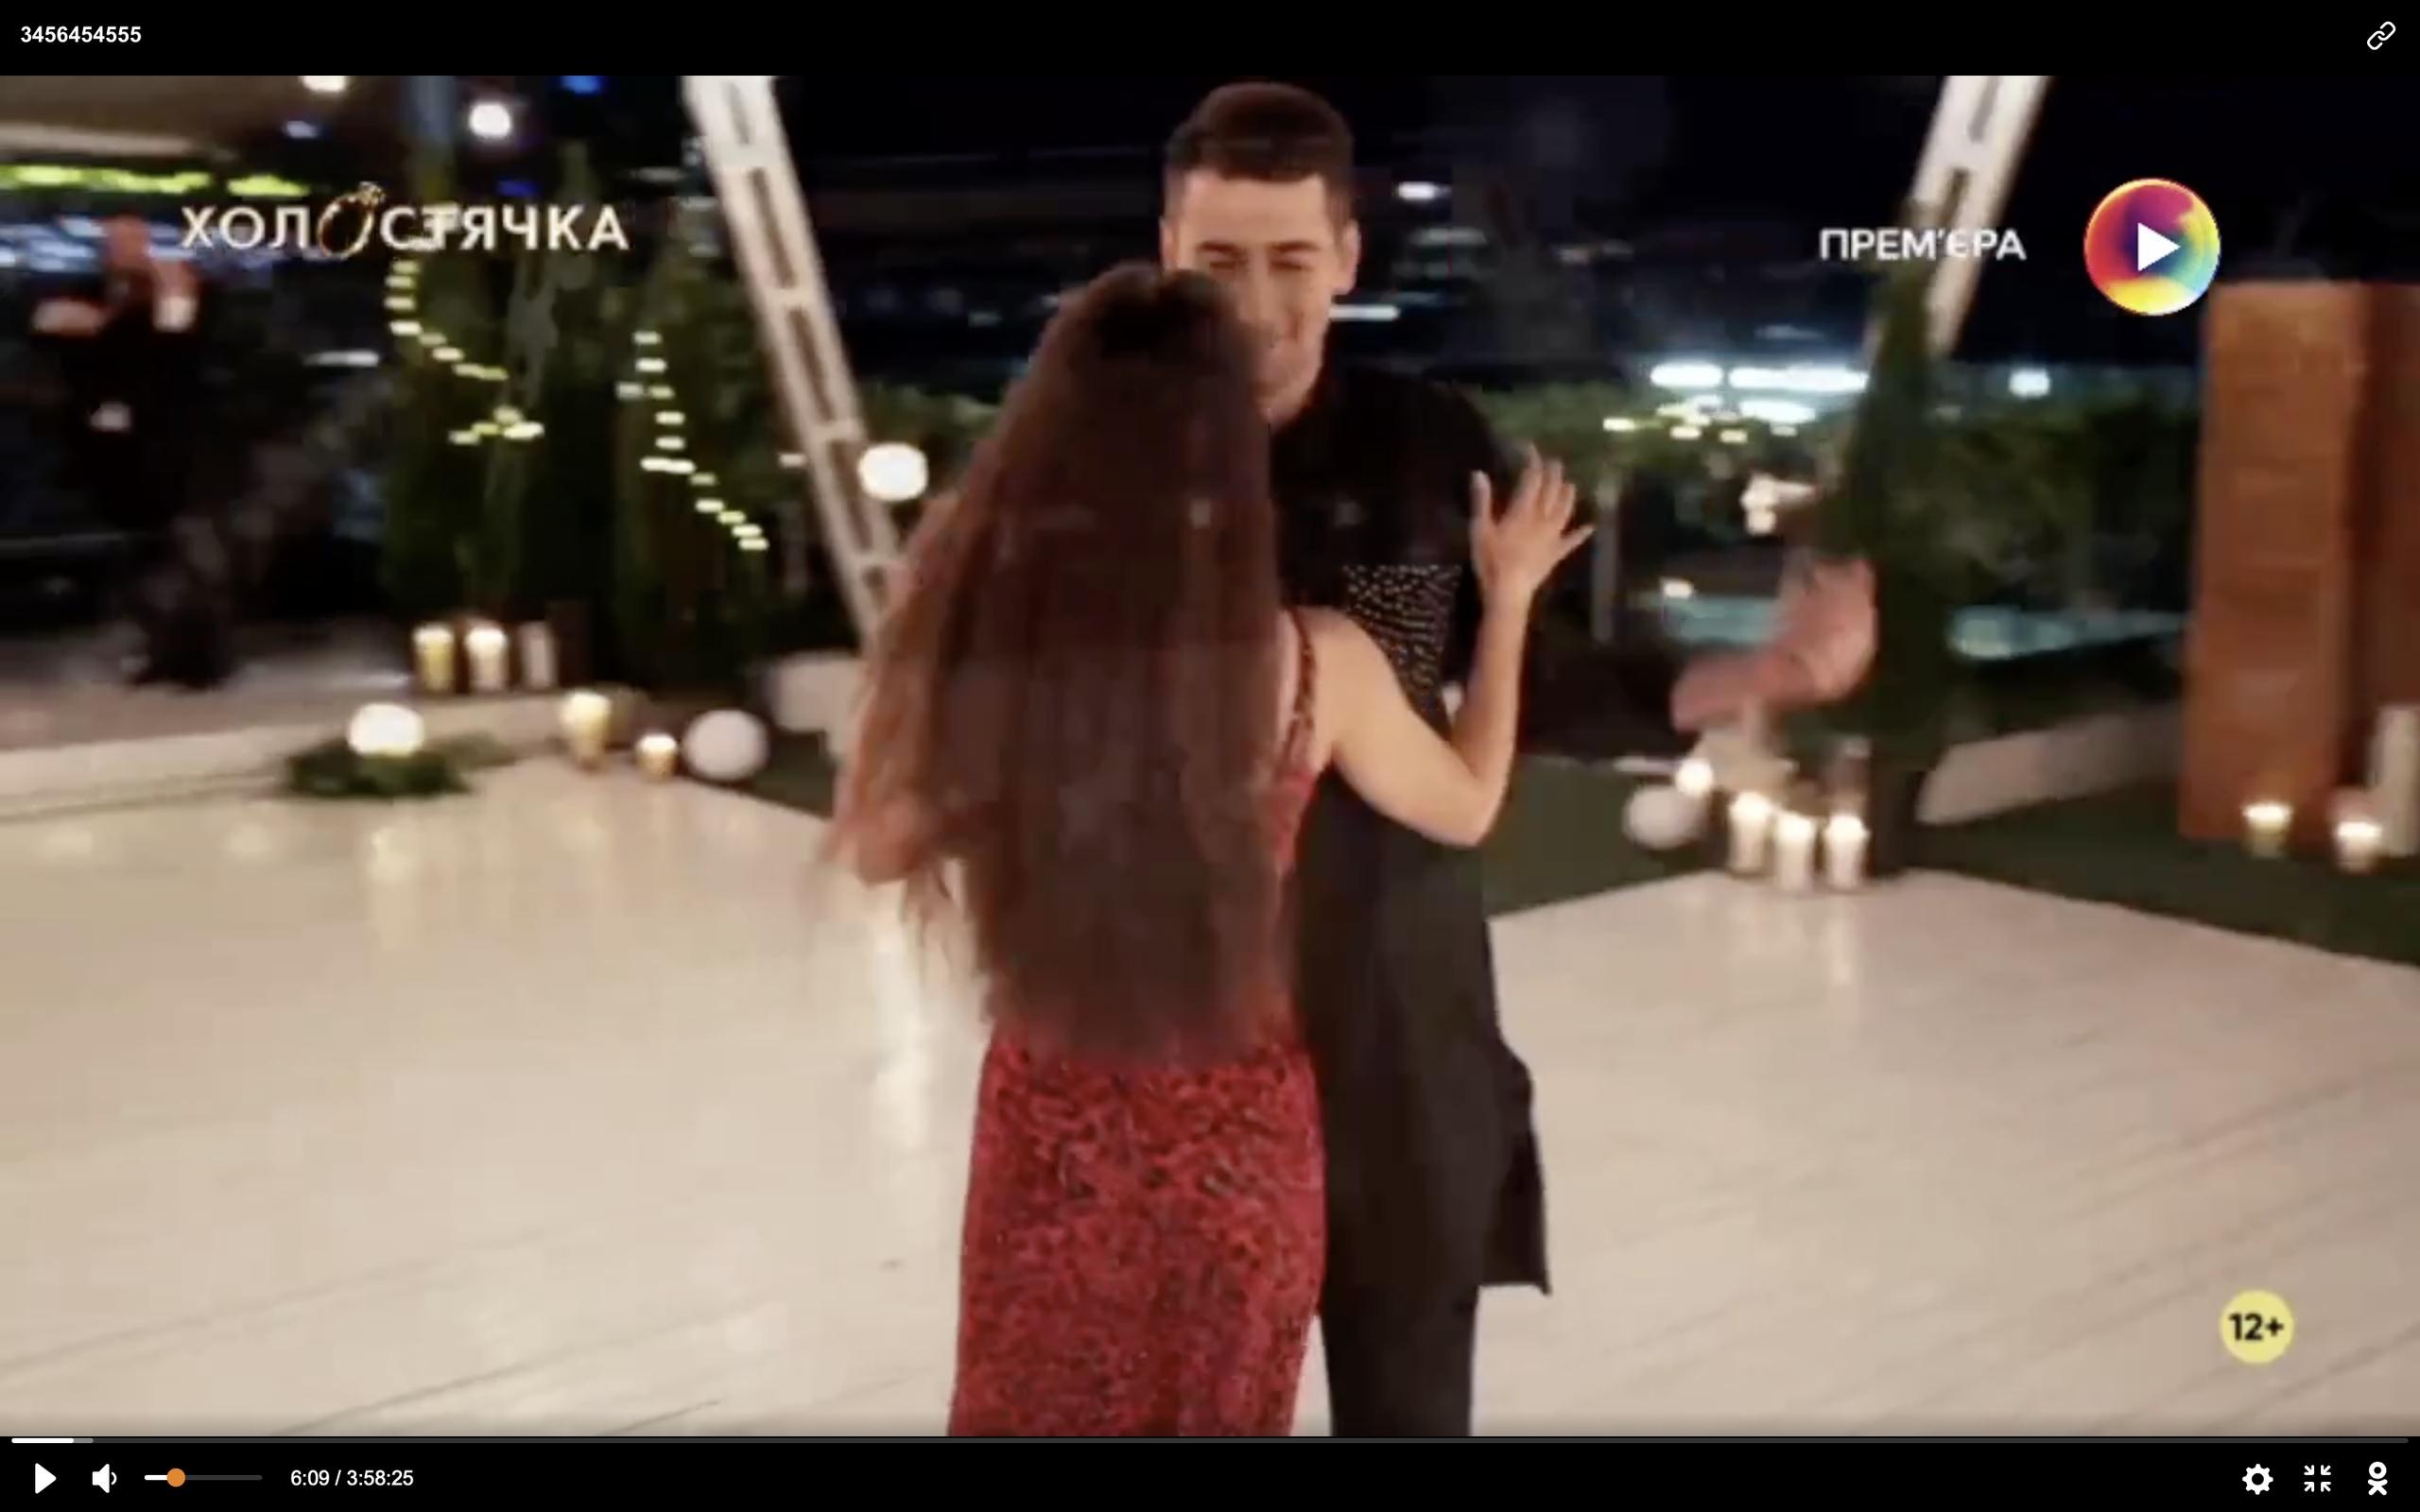 Bachelorette Ukraine - Season 1 - Ksenia Mishina - Episode Discussion - *Sleuthing Spoilers* - Page 5 BS9iWZKnCFE